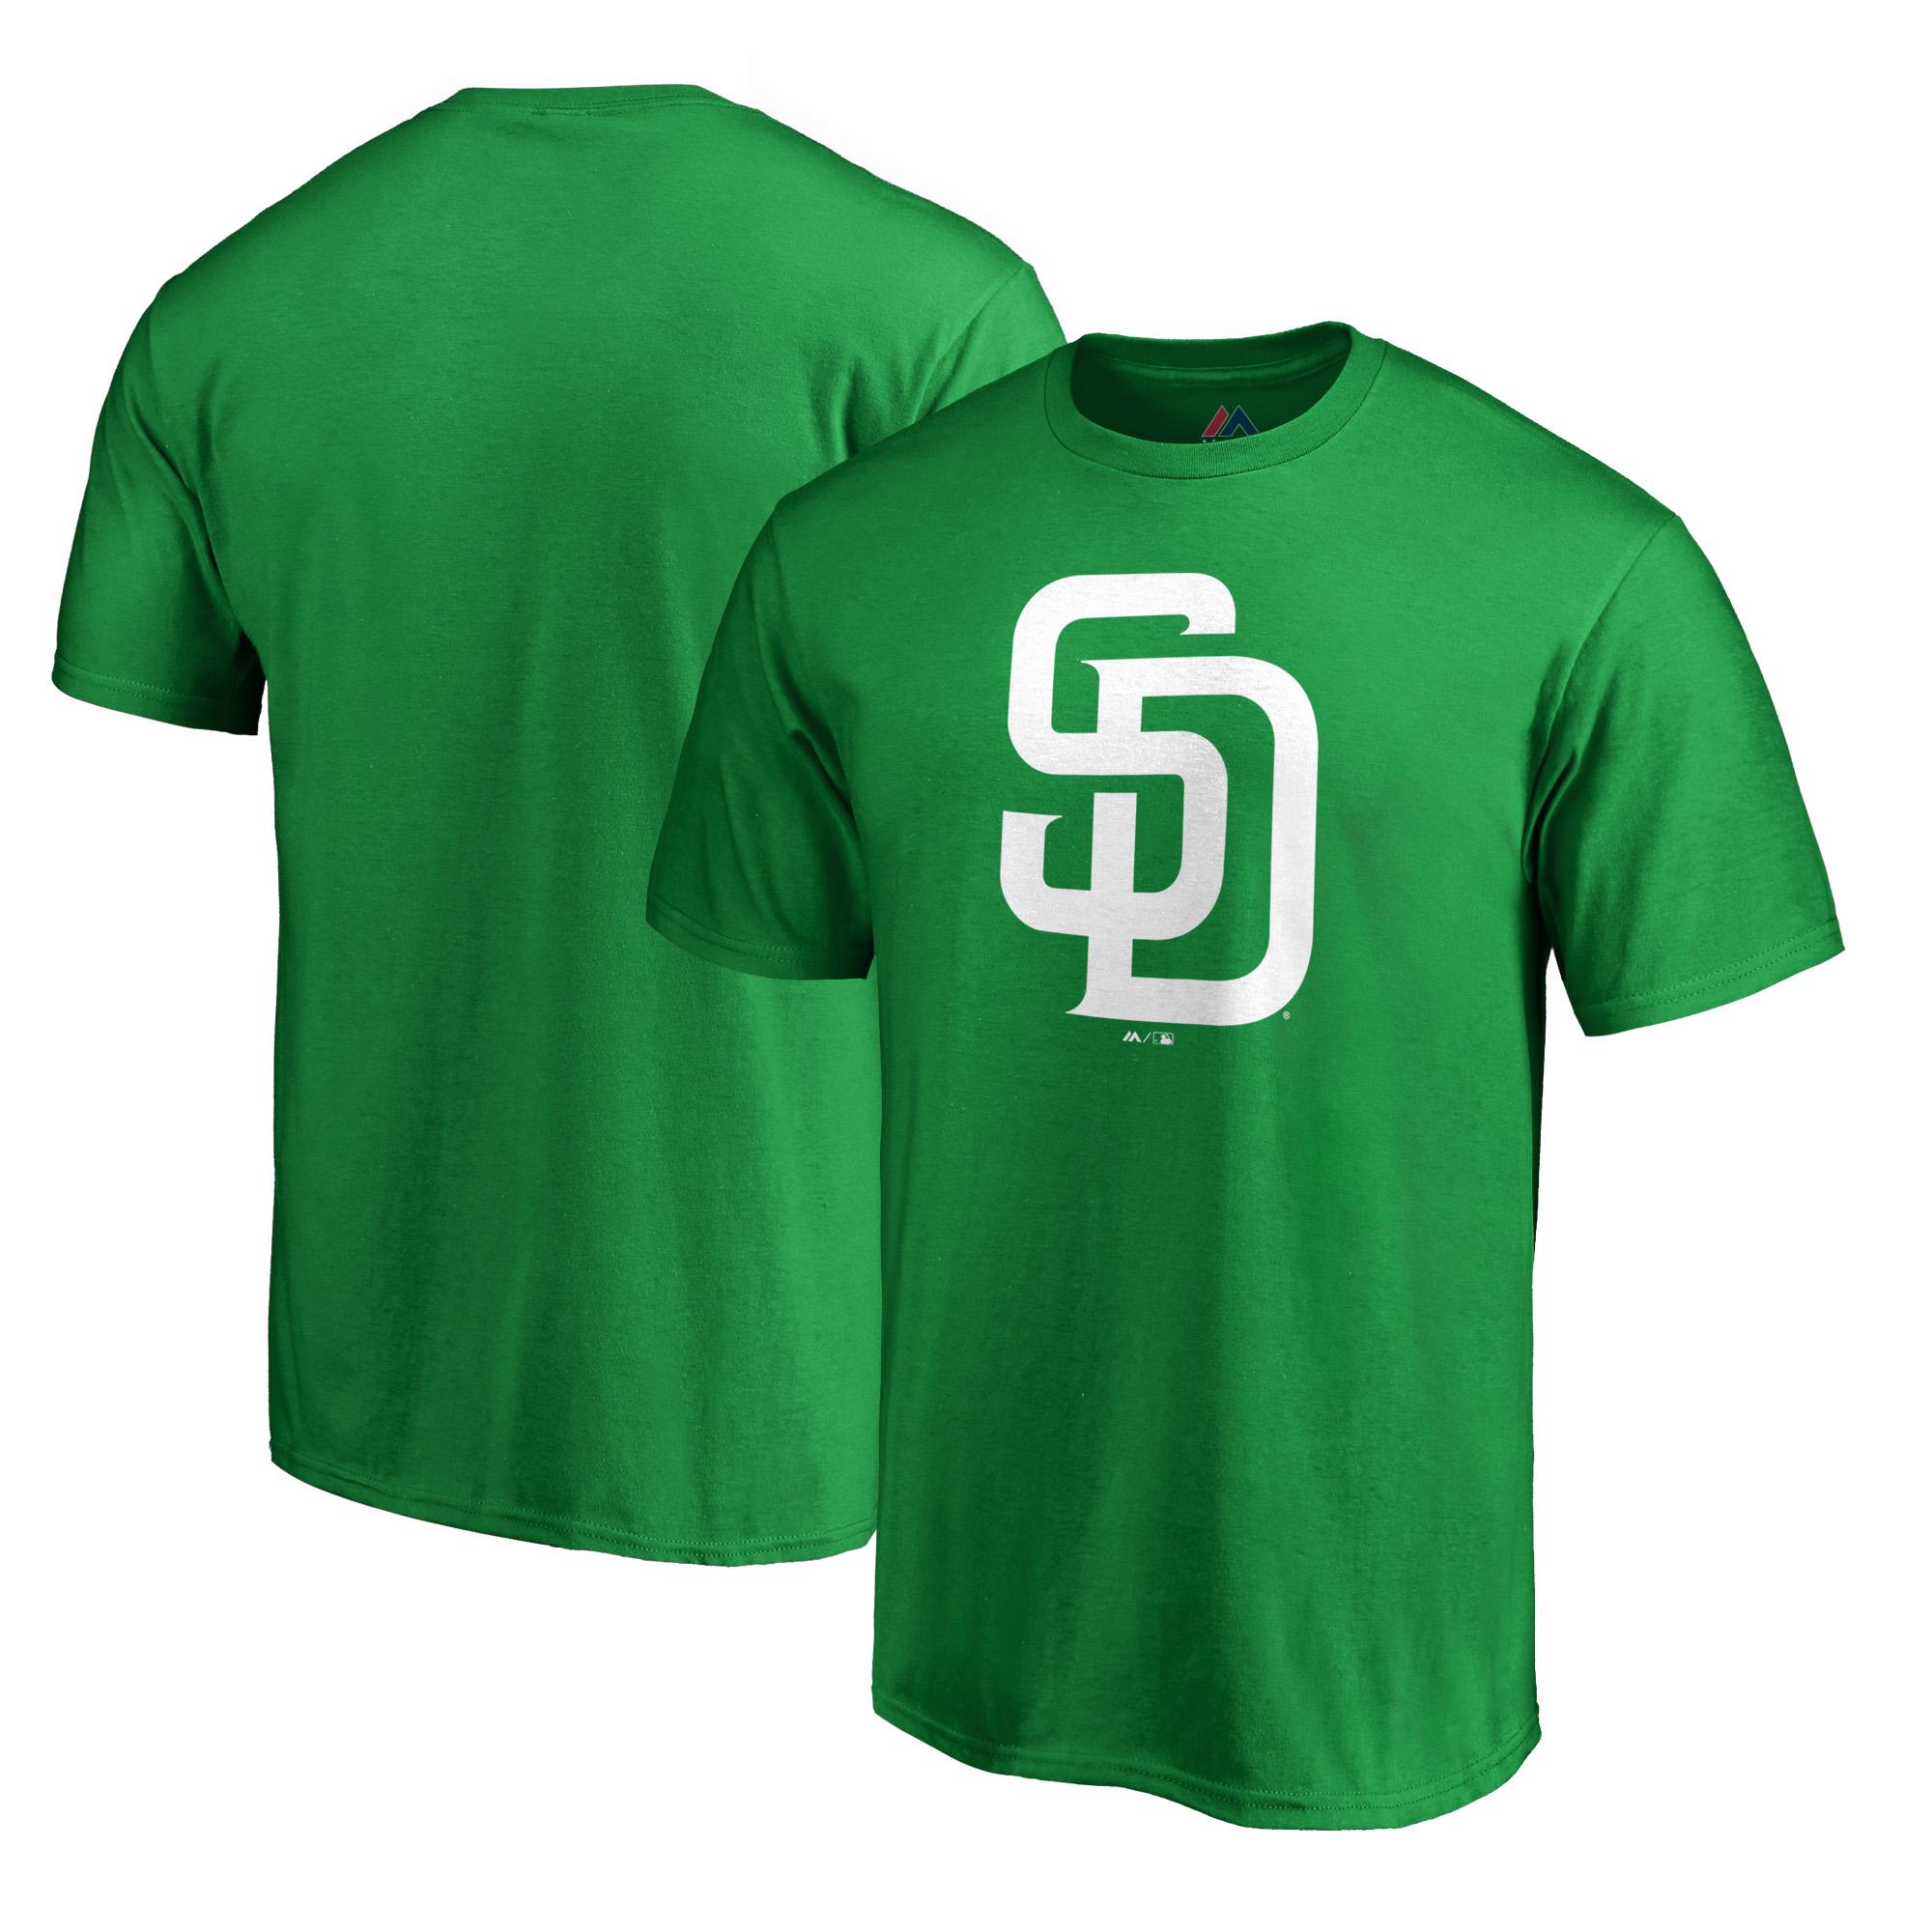 San Diego Padres Majestic St. Patrick's Day White Logo T-Shirt - Kelly Green